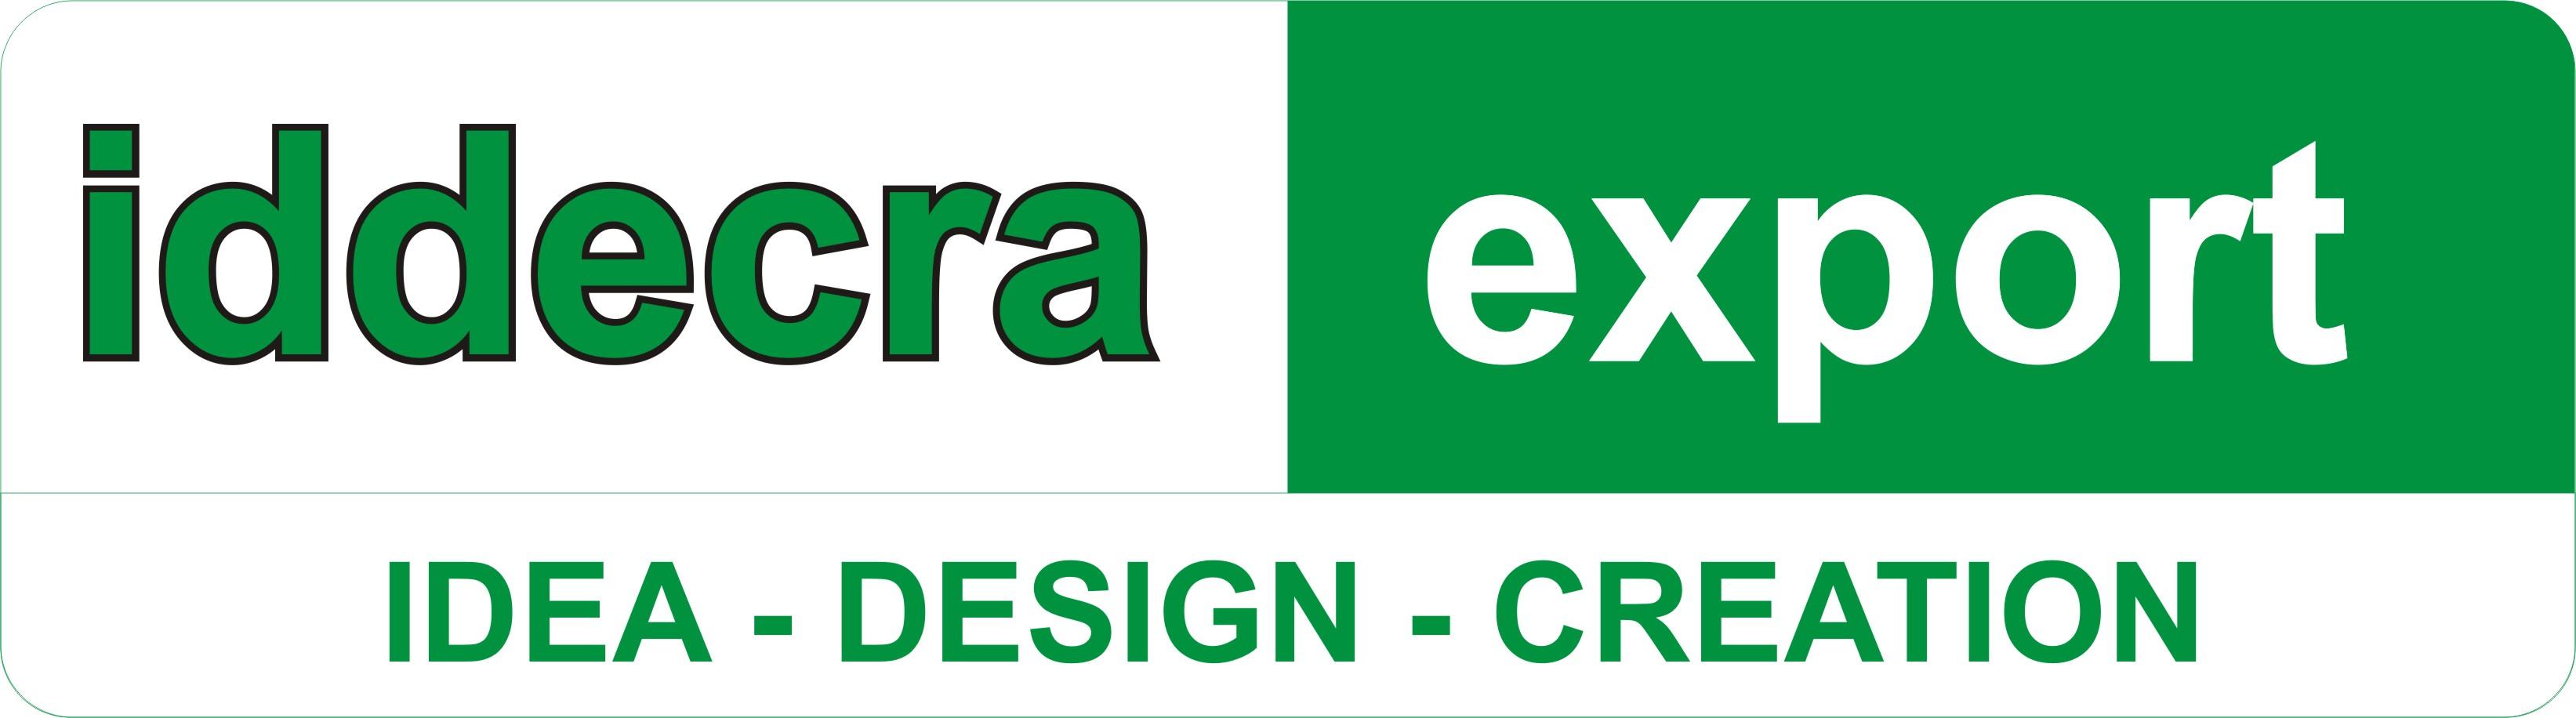 Iddecra Export logo